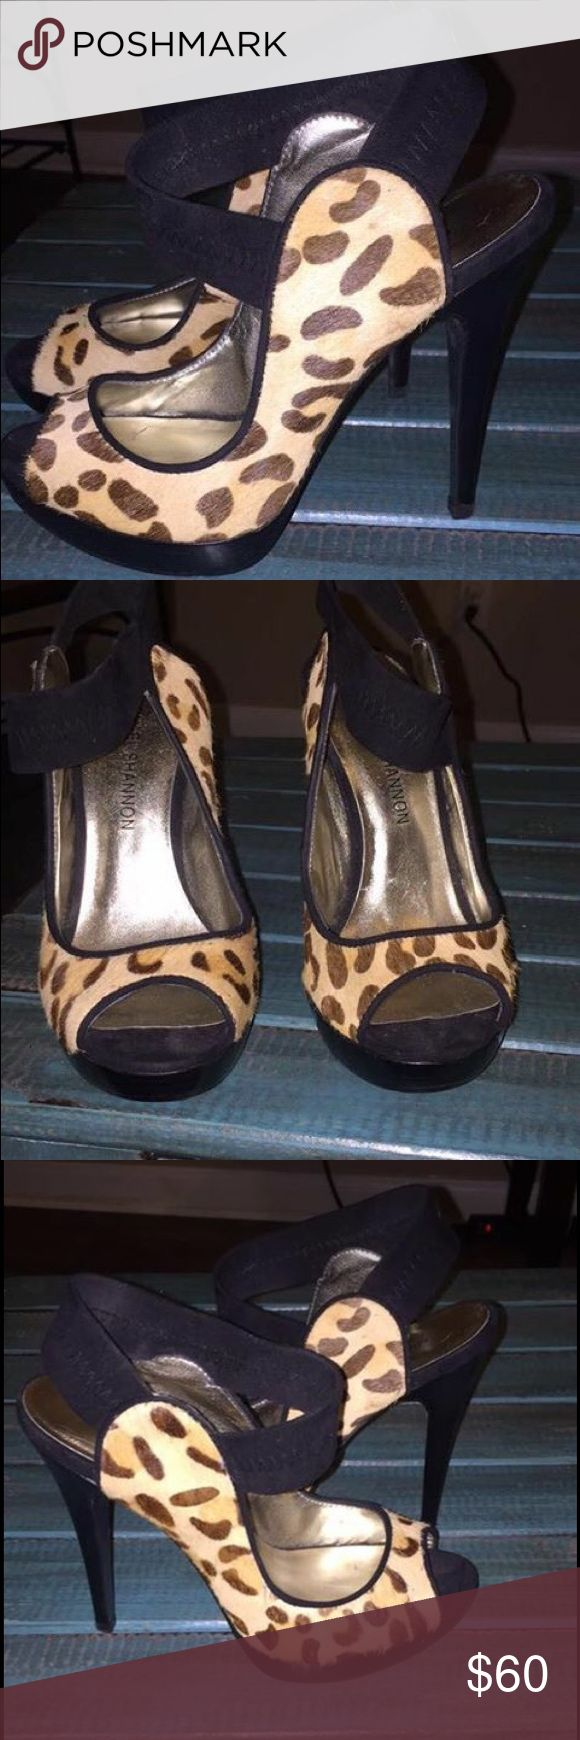 Michael Shannon Leopard Heels Size 7 .. worn 3 times Michael Shannon Shoes Heels